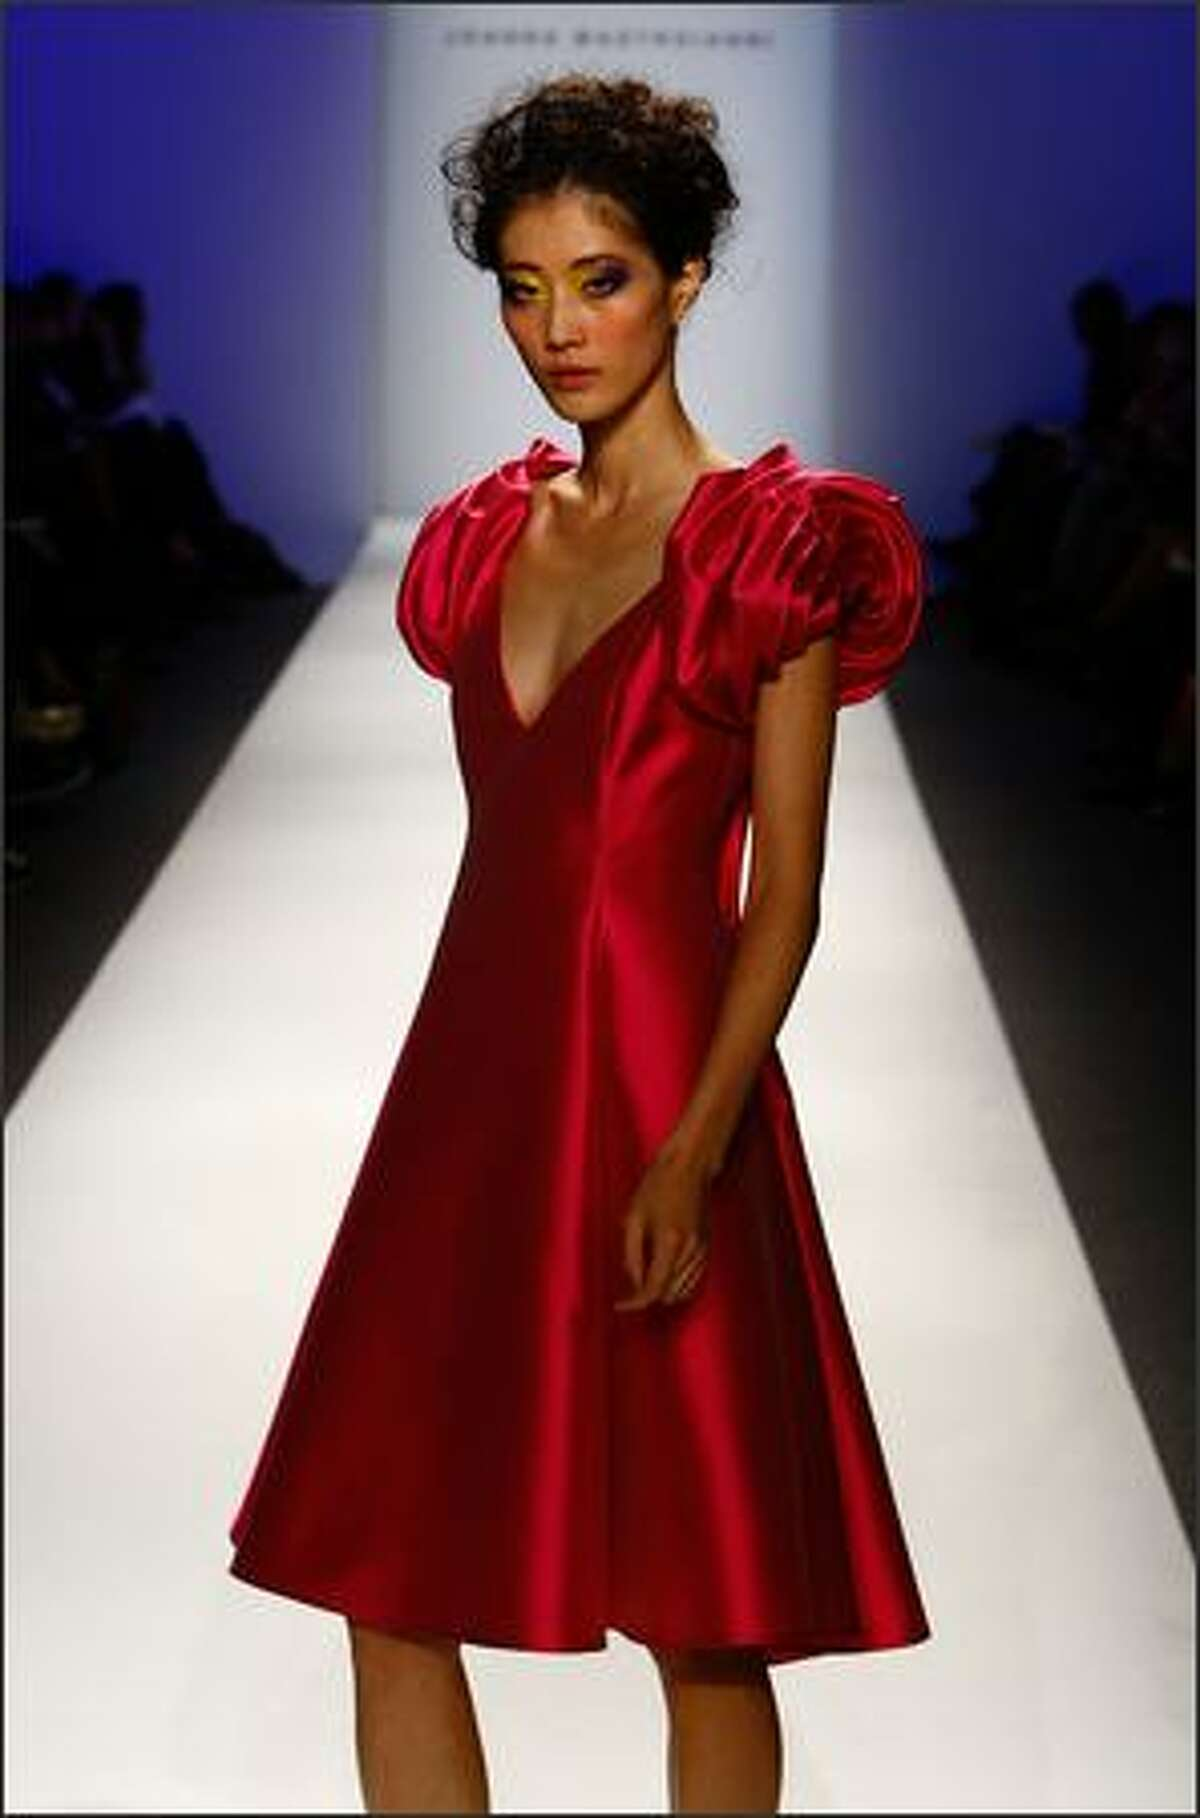 A model walks the runway at the Joanna Mastroianni show.